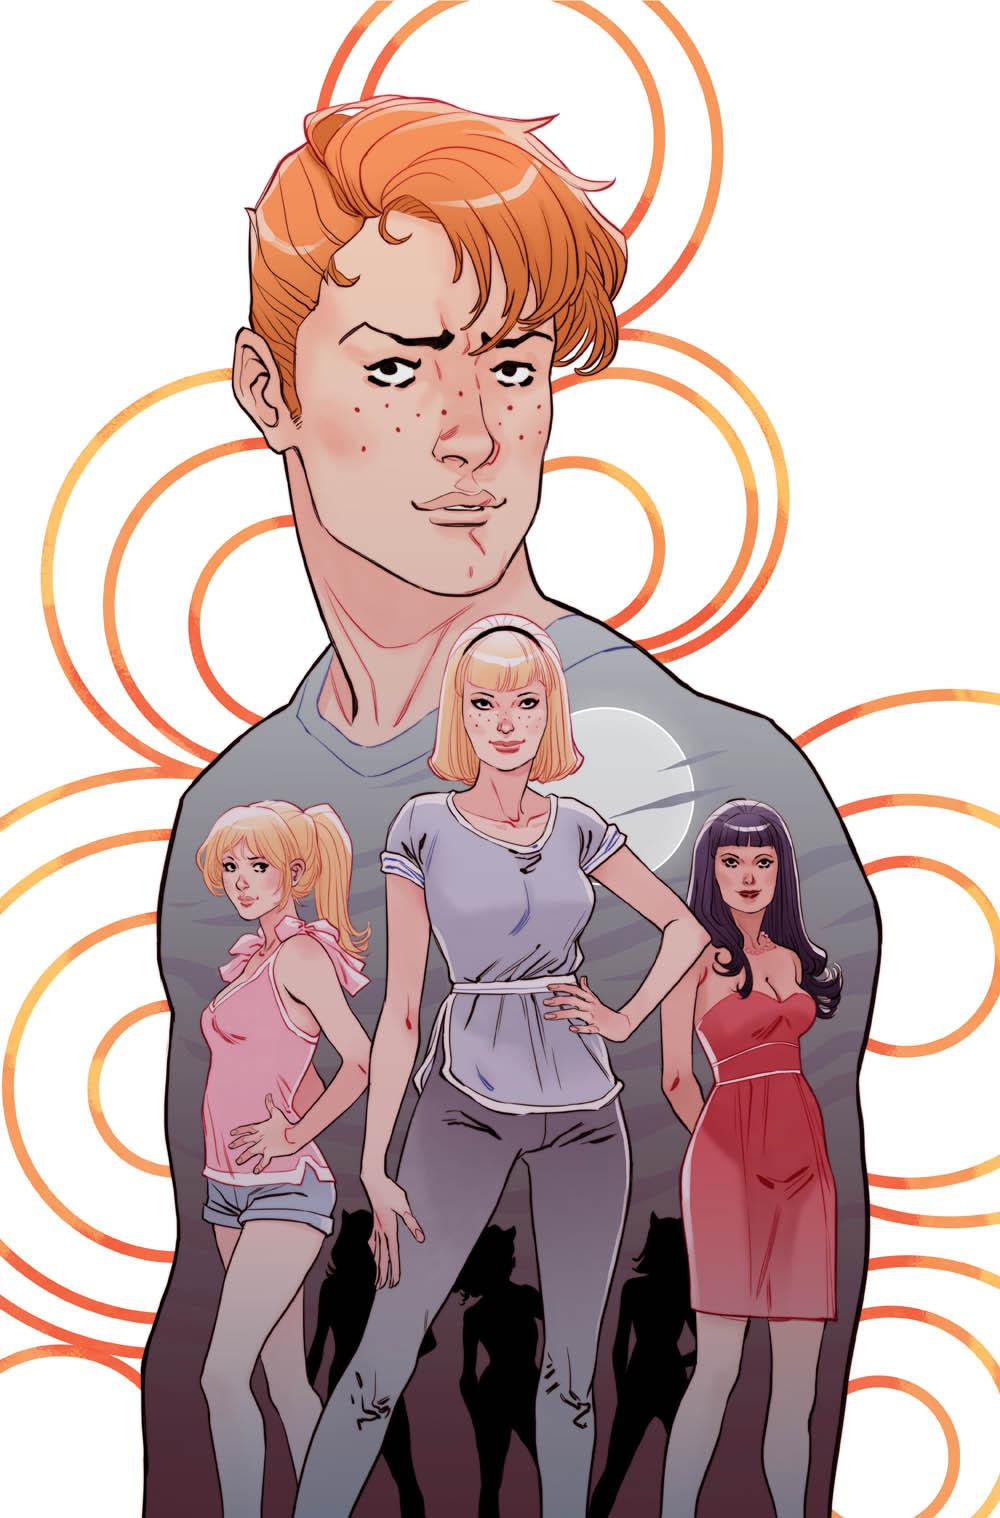 Archie 700 (2018)